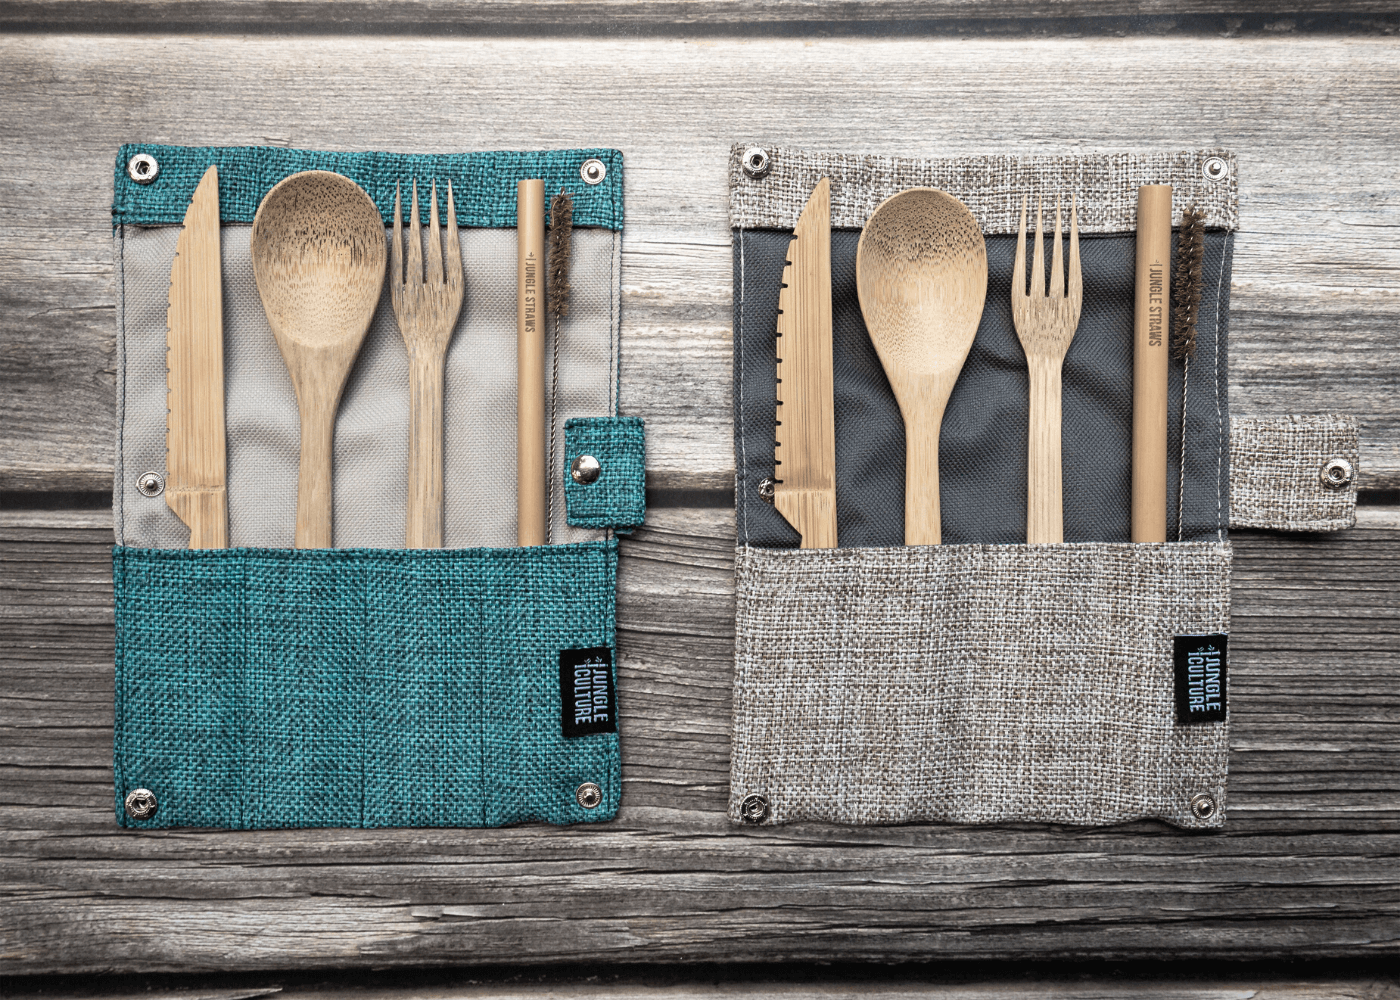 JC003 – bamboo-cutlery-set-utensils